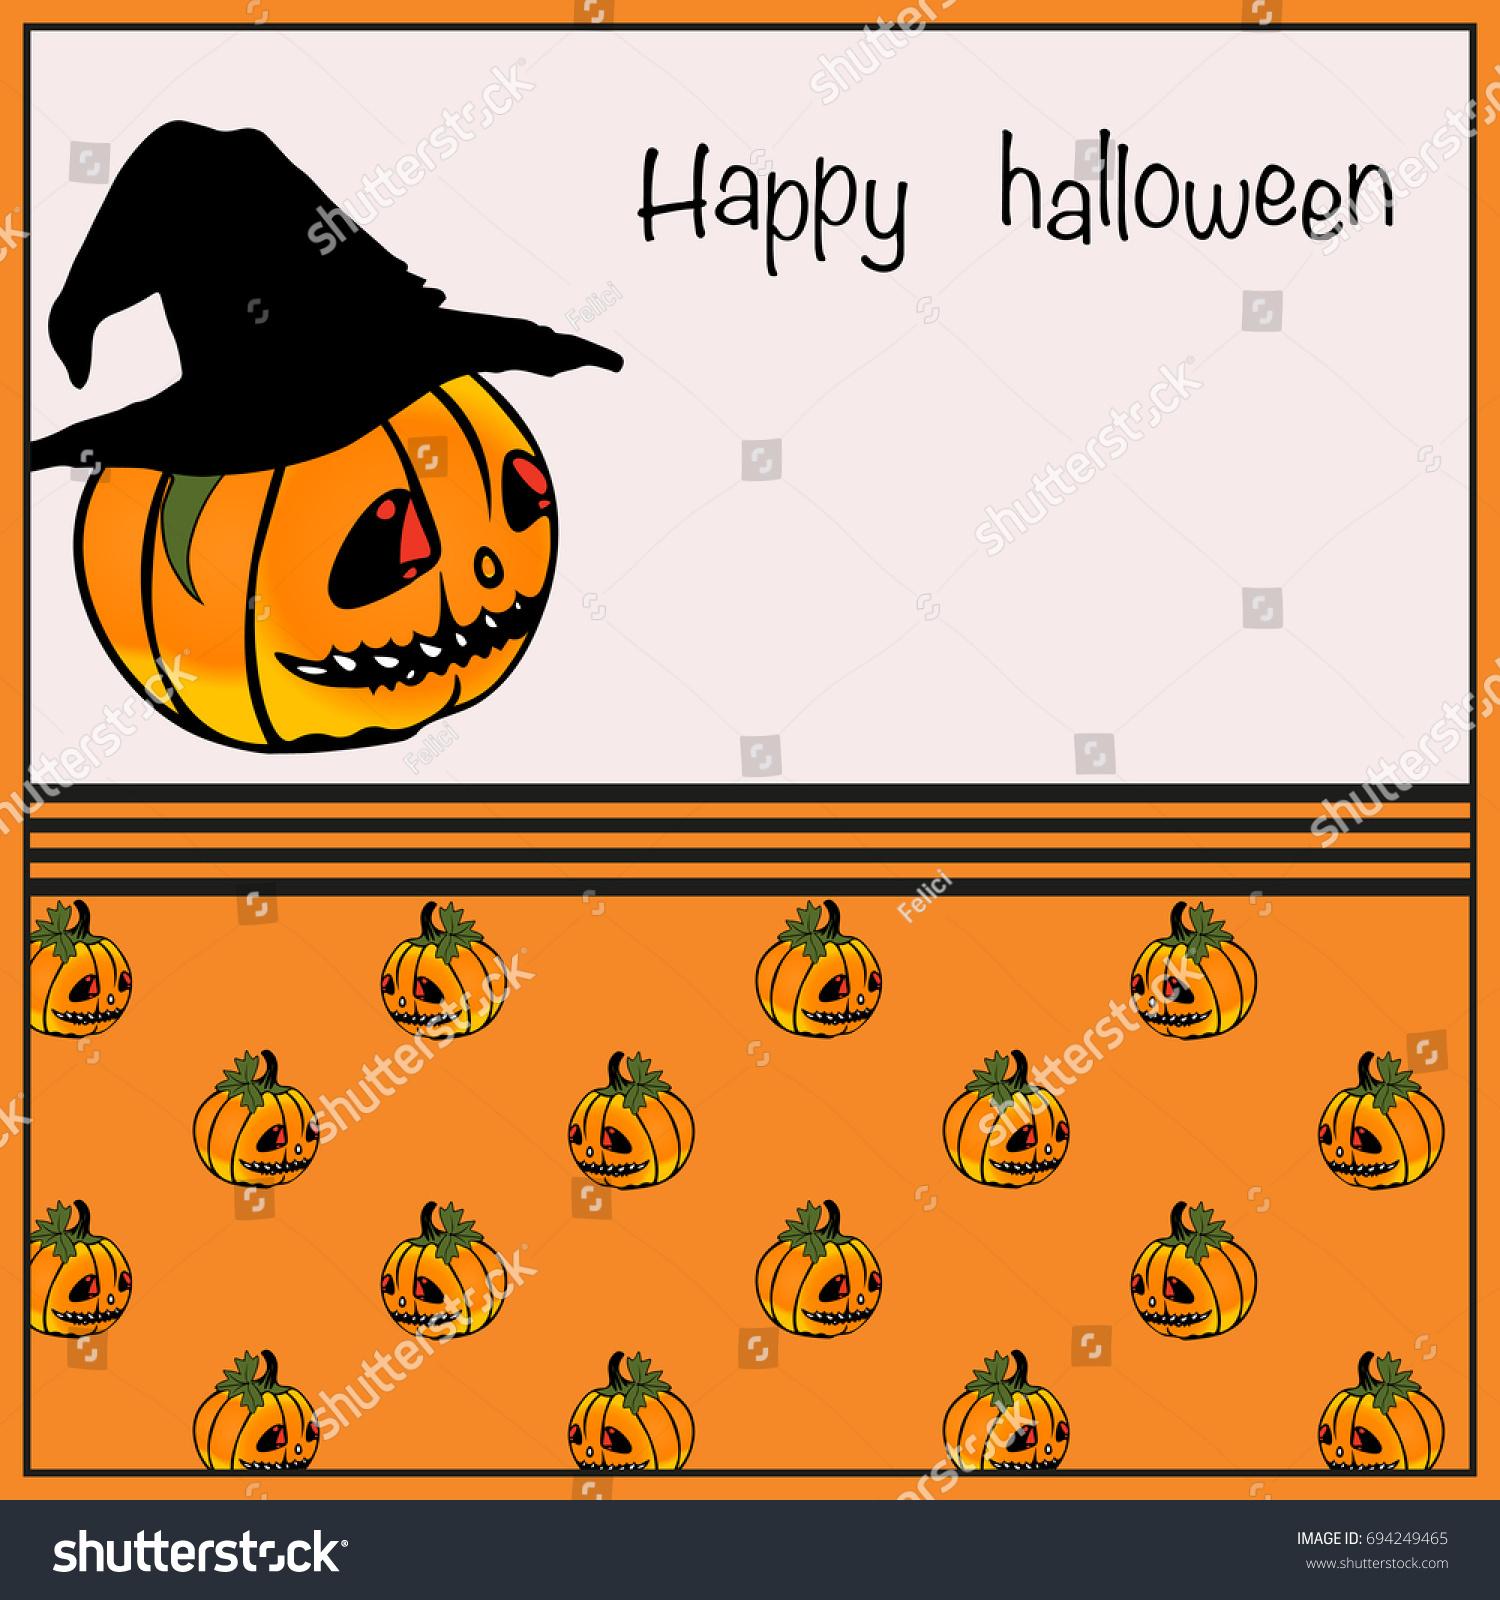 Halloween Party Invitation Card Pumpkin Full Stock Vector 694249465 ...